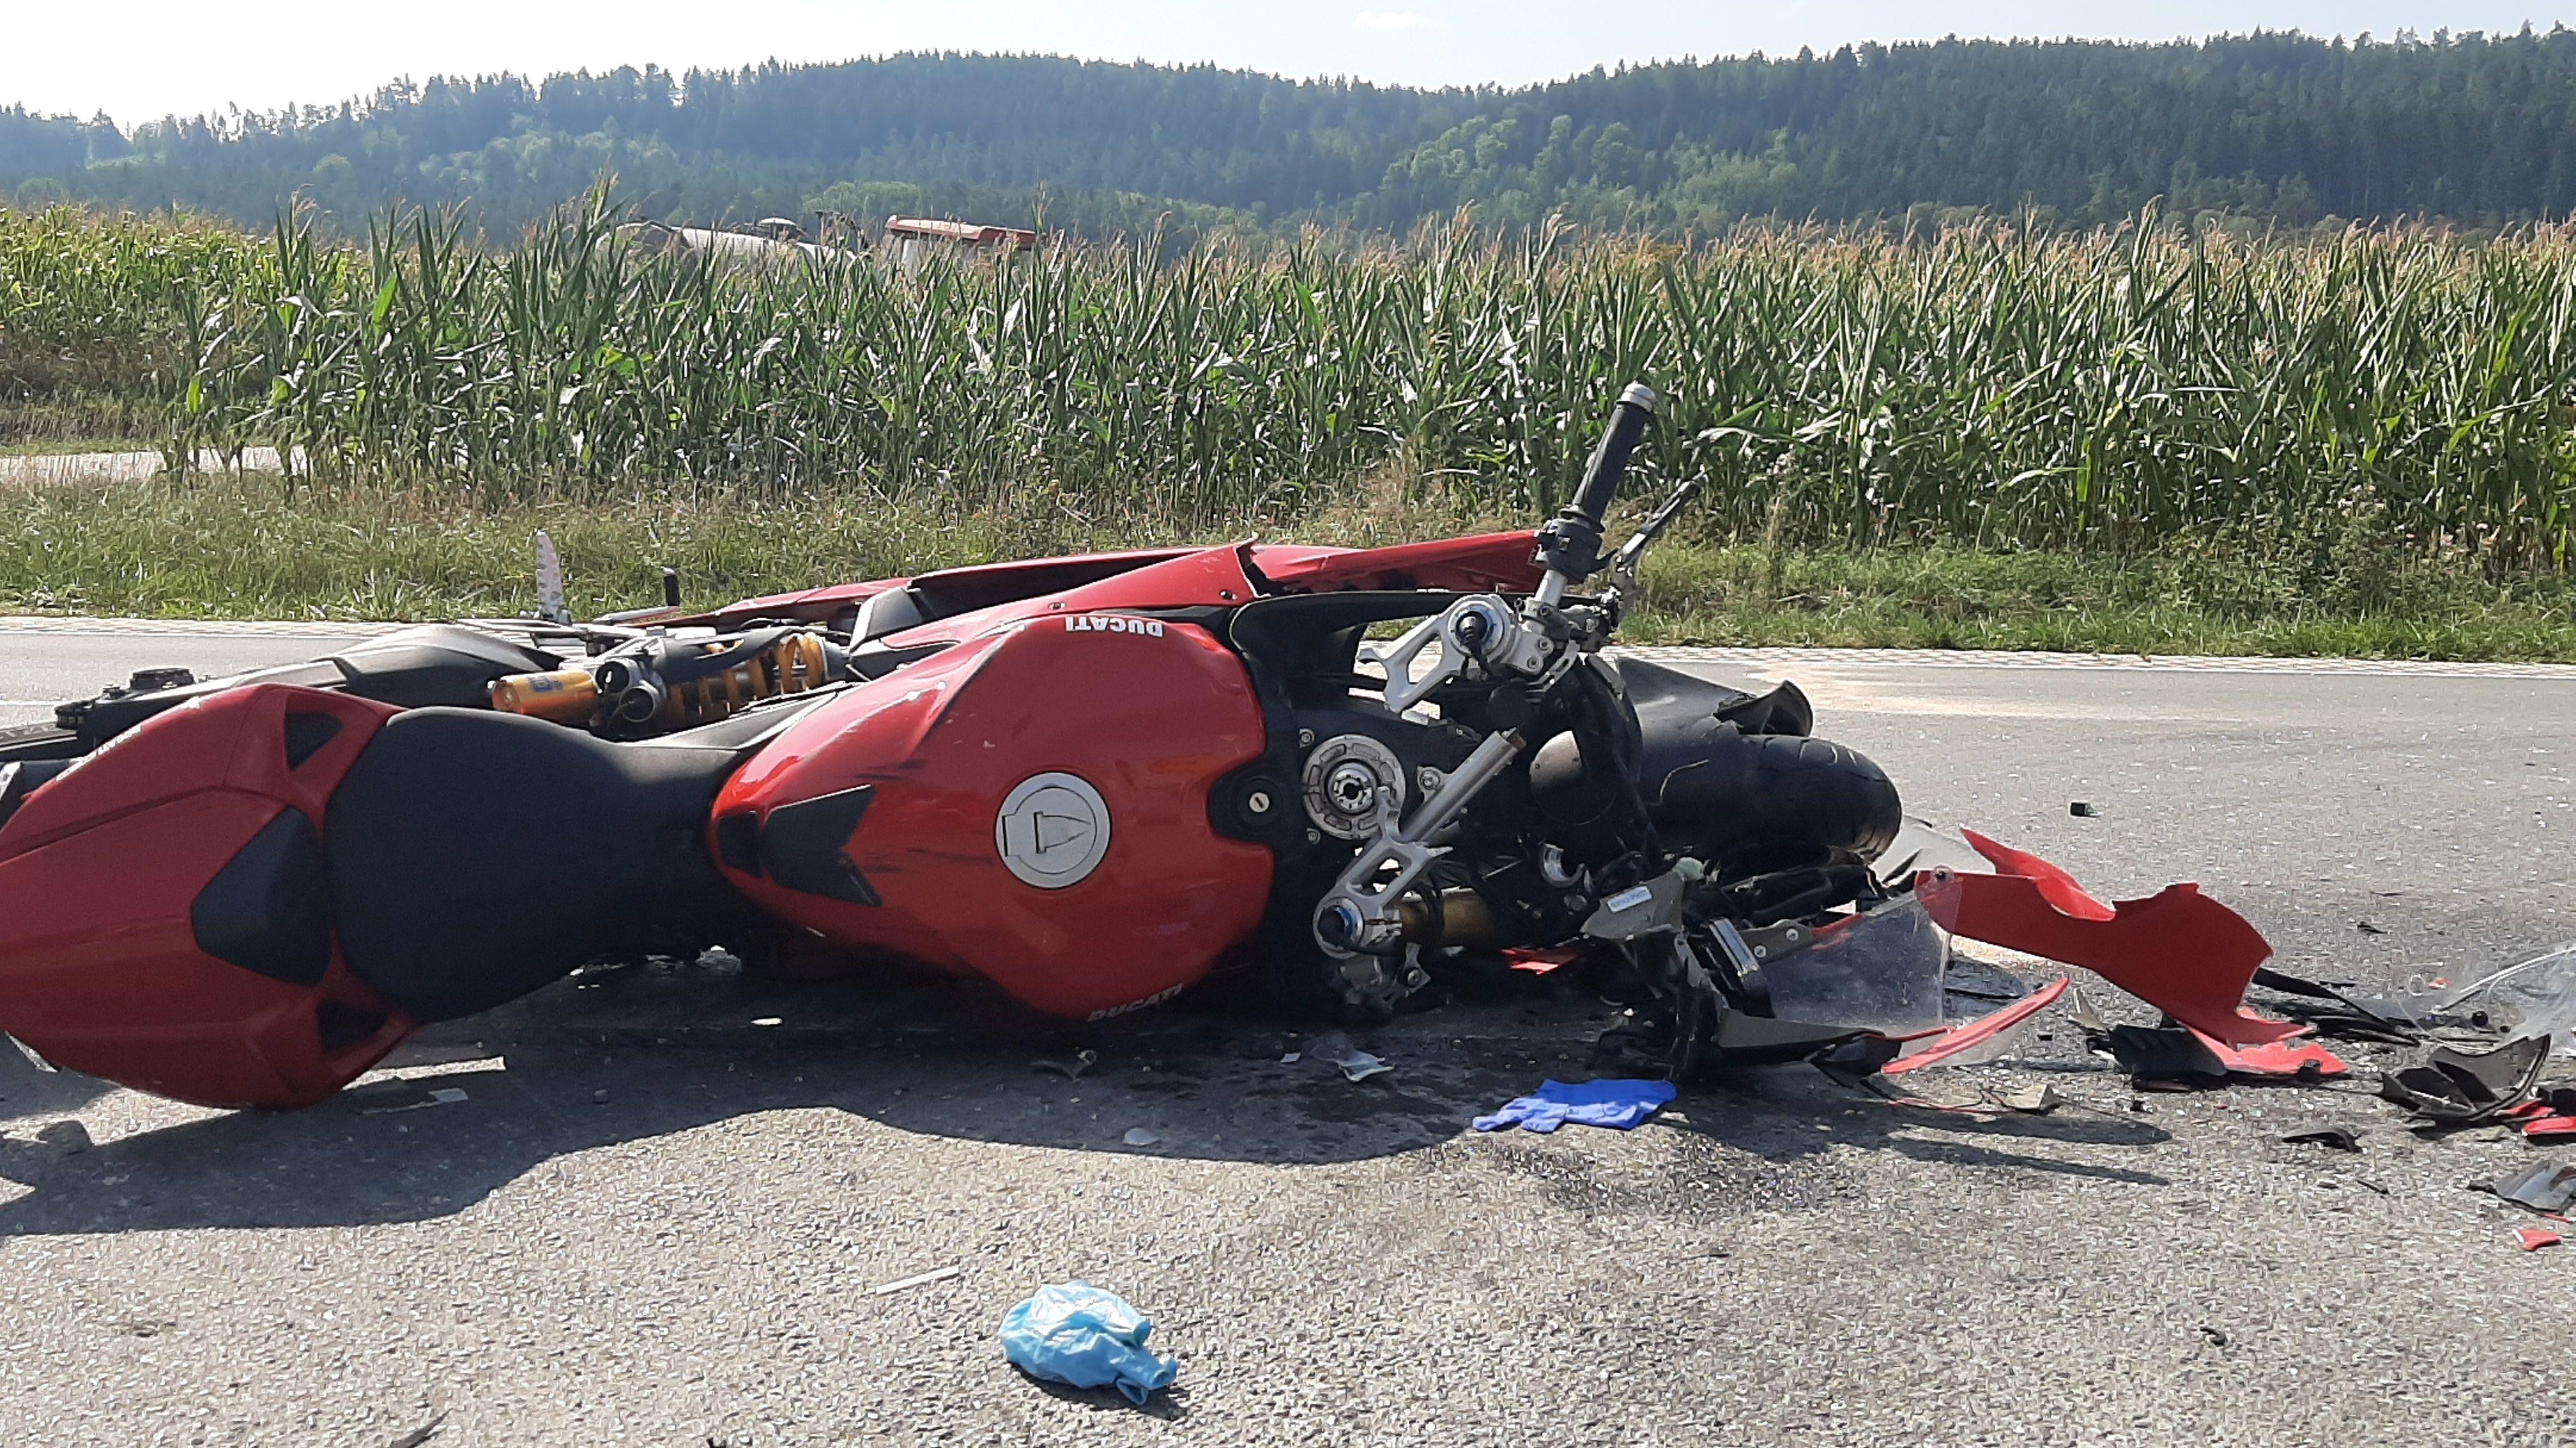 Motorrad liegt auf der Fahrbahn